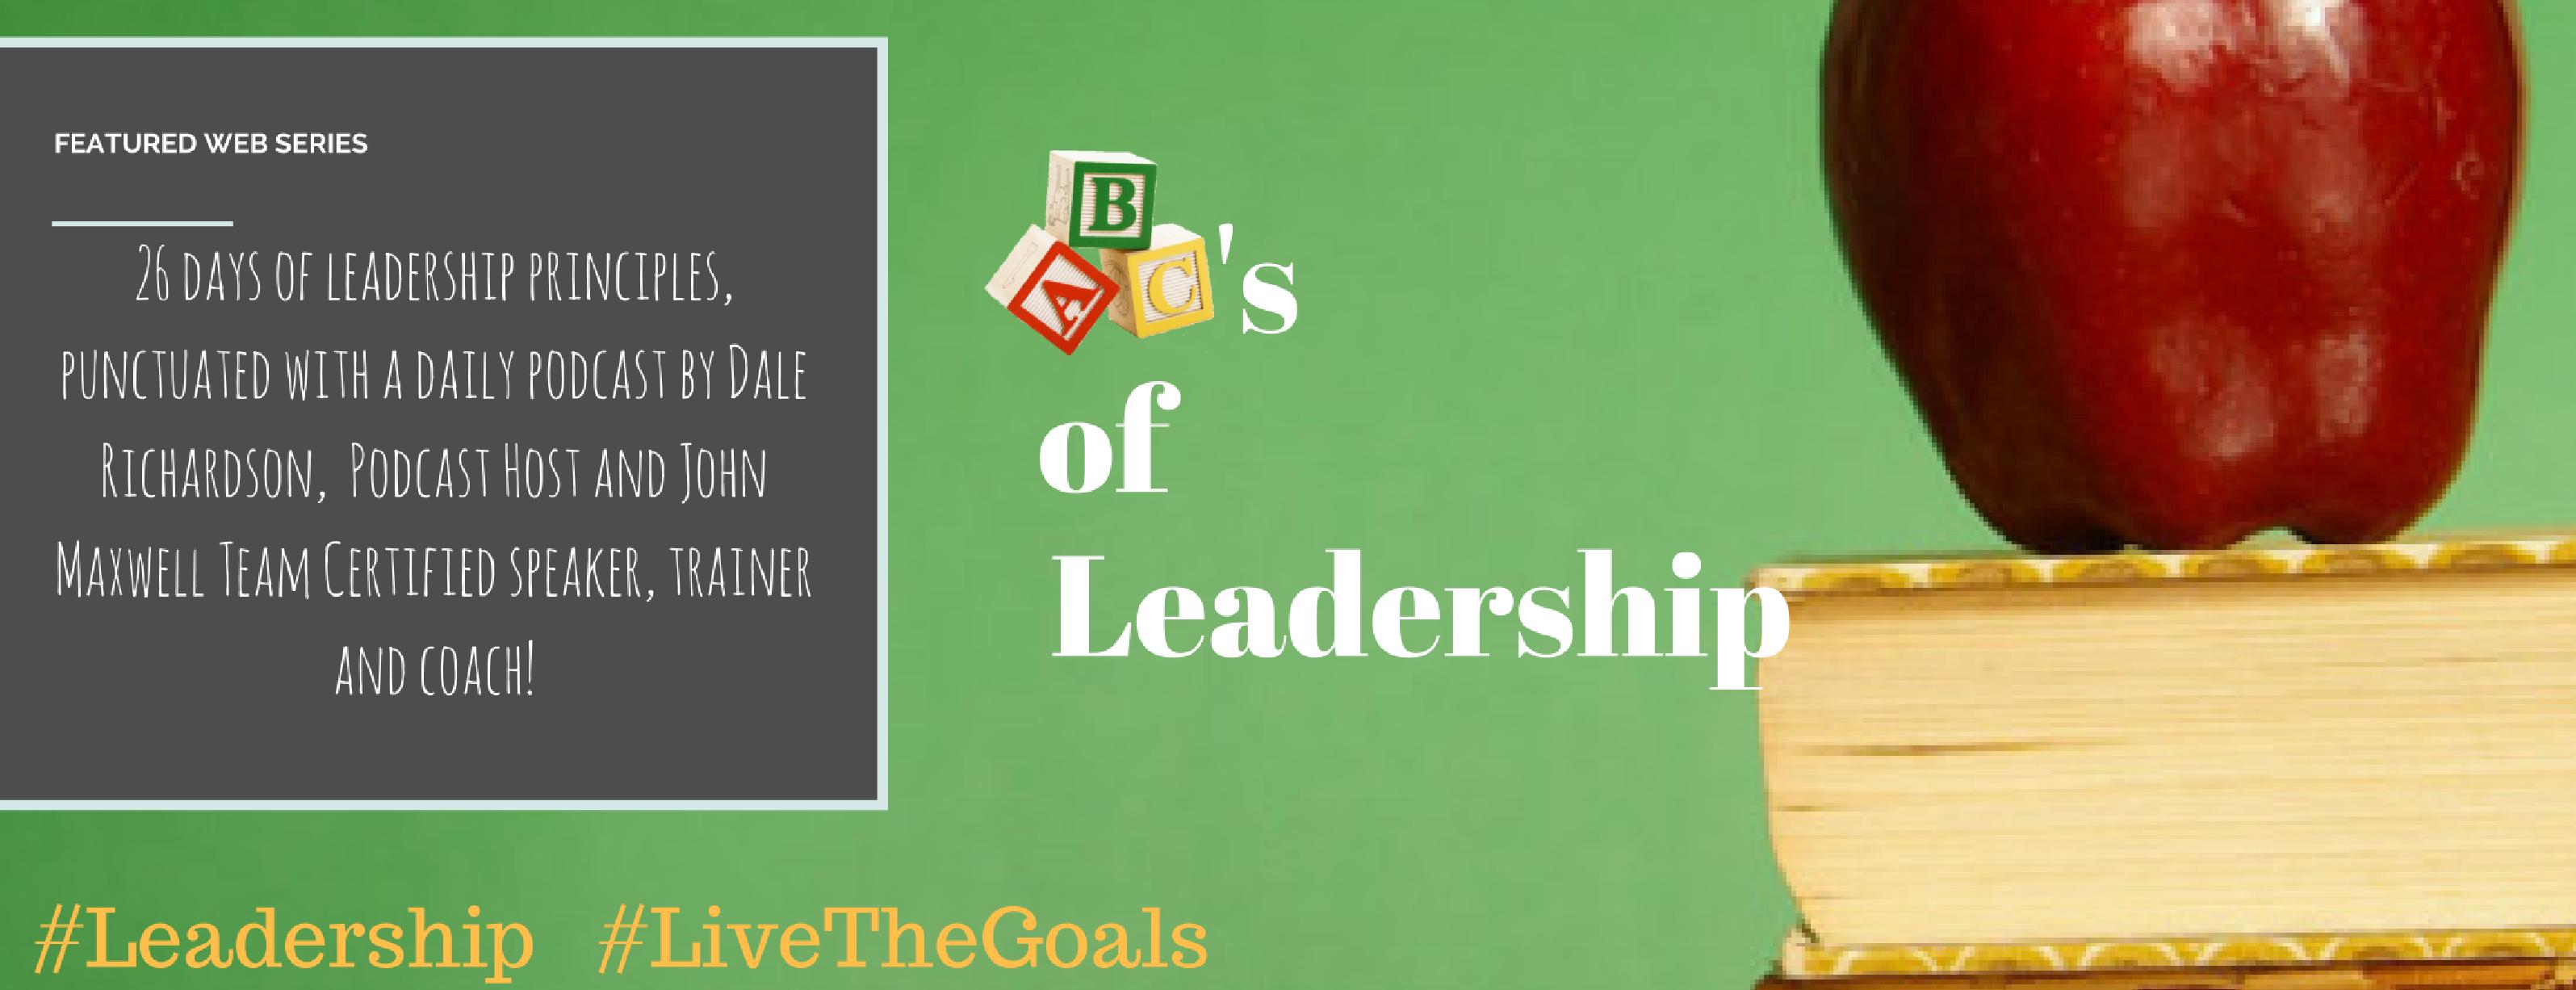 ABC's of Leadership (Header) Green